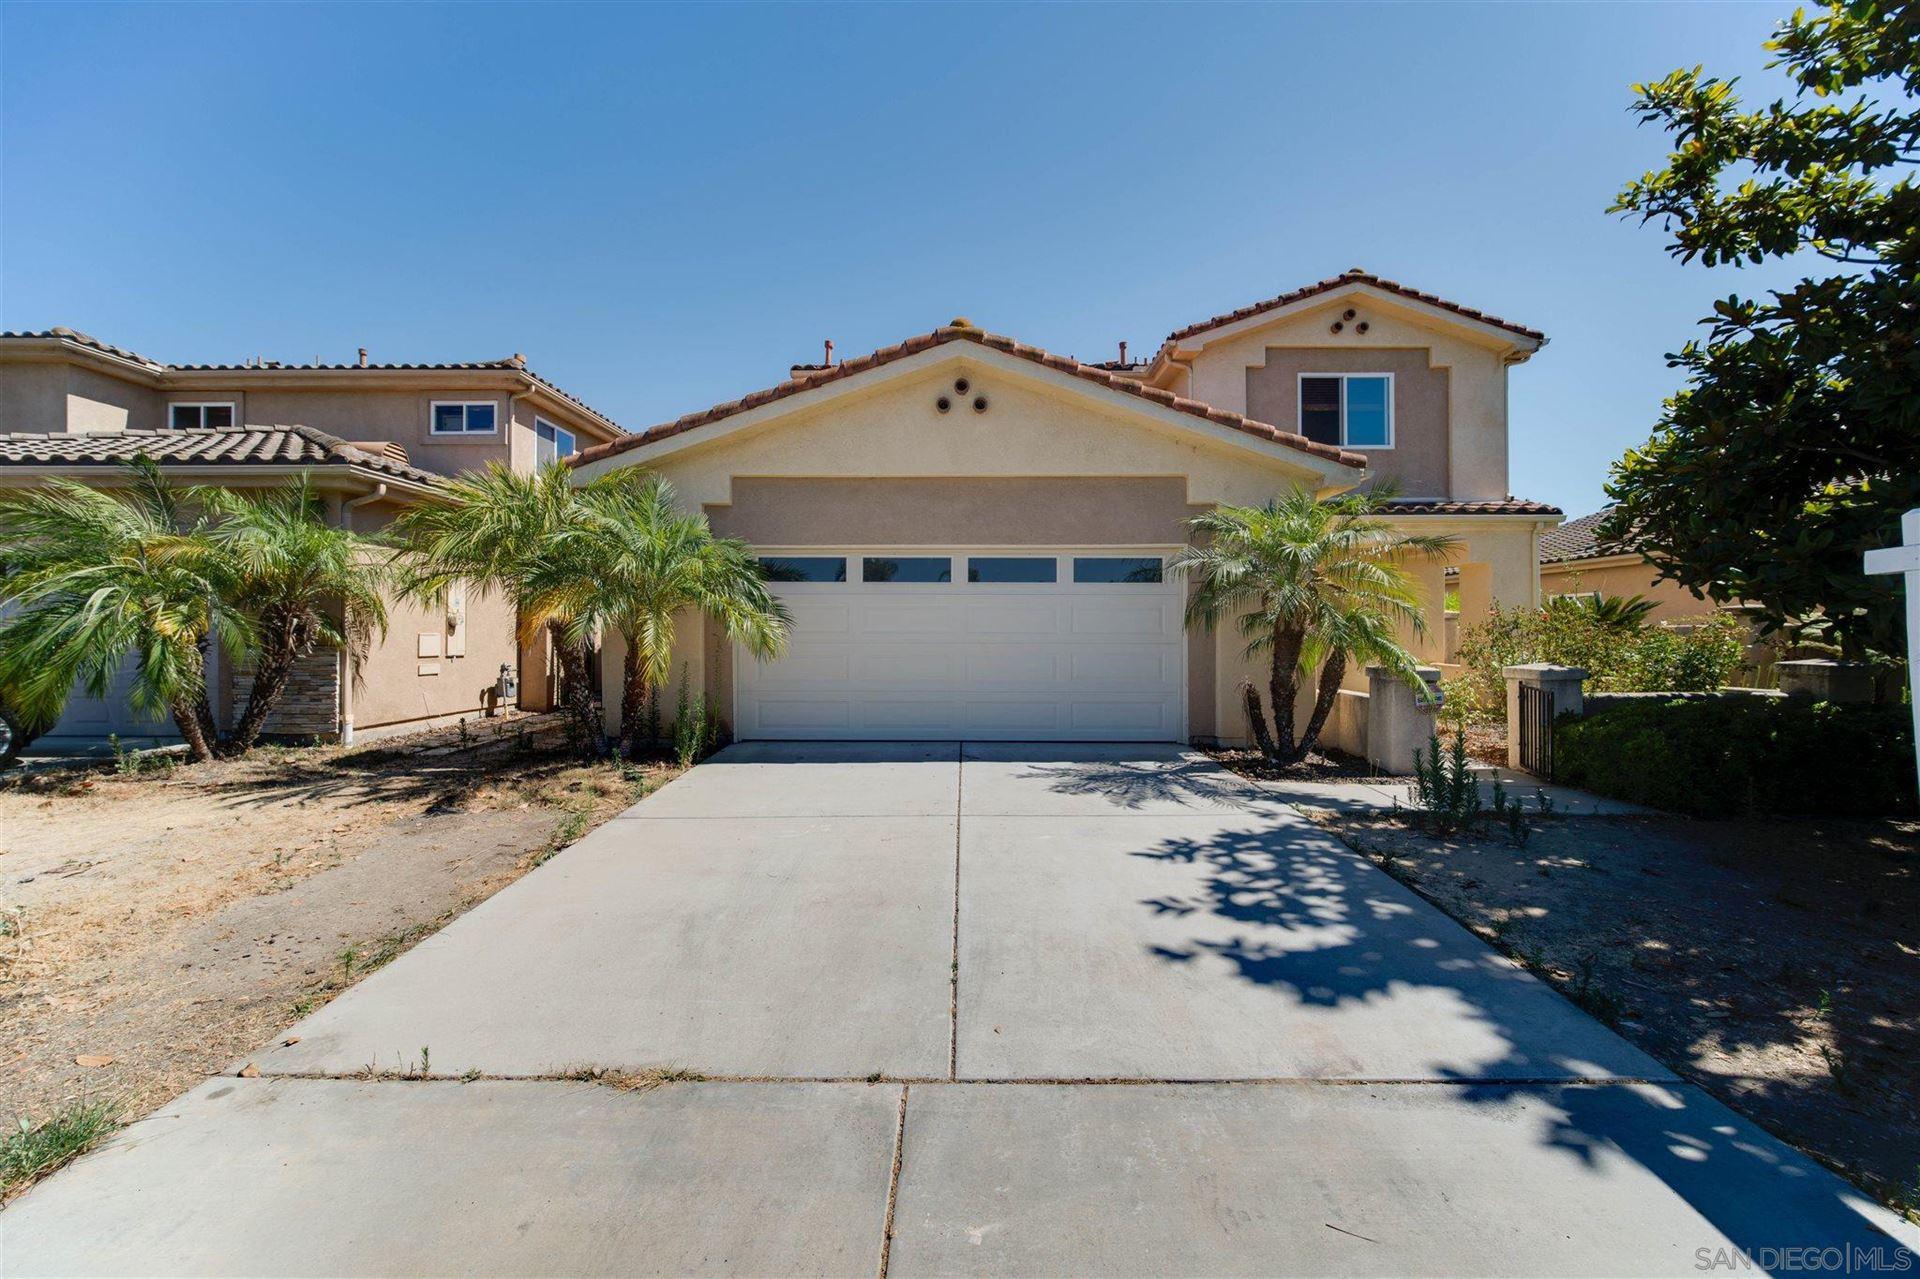 Photo of 12735 Oak Knoll Rd, Poway, CA 92064 (MLS # 210021192)